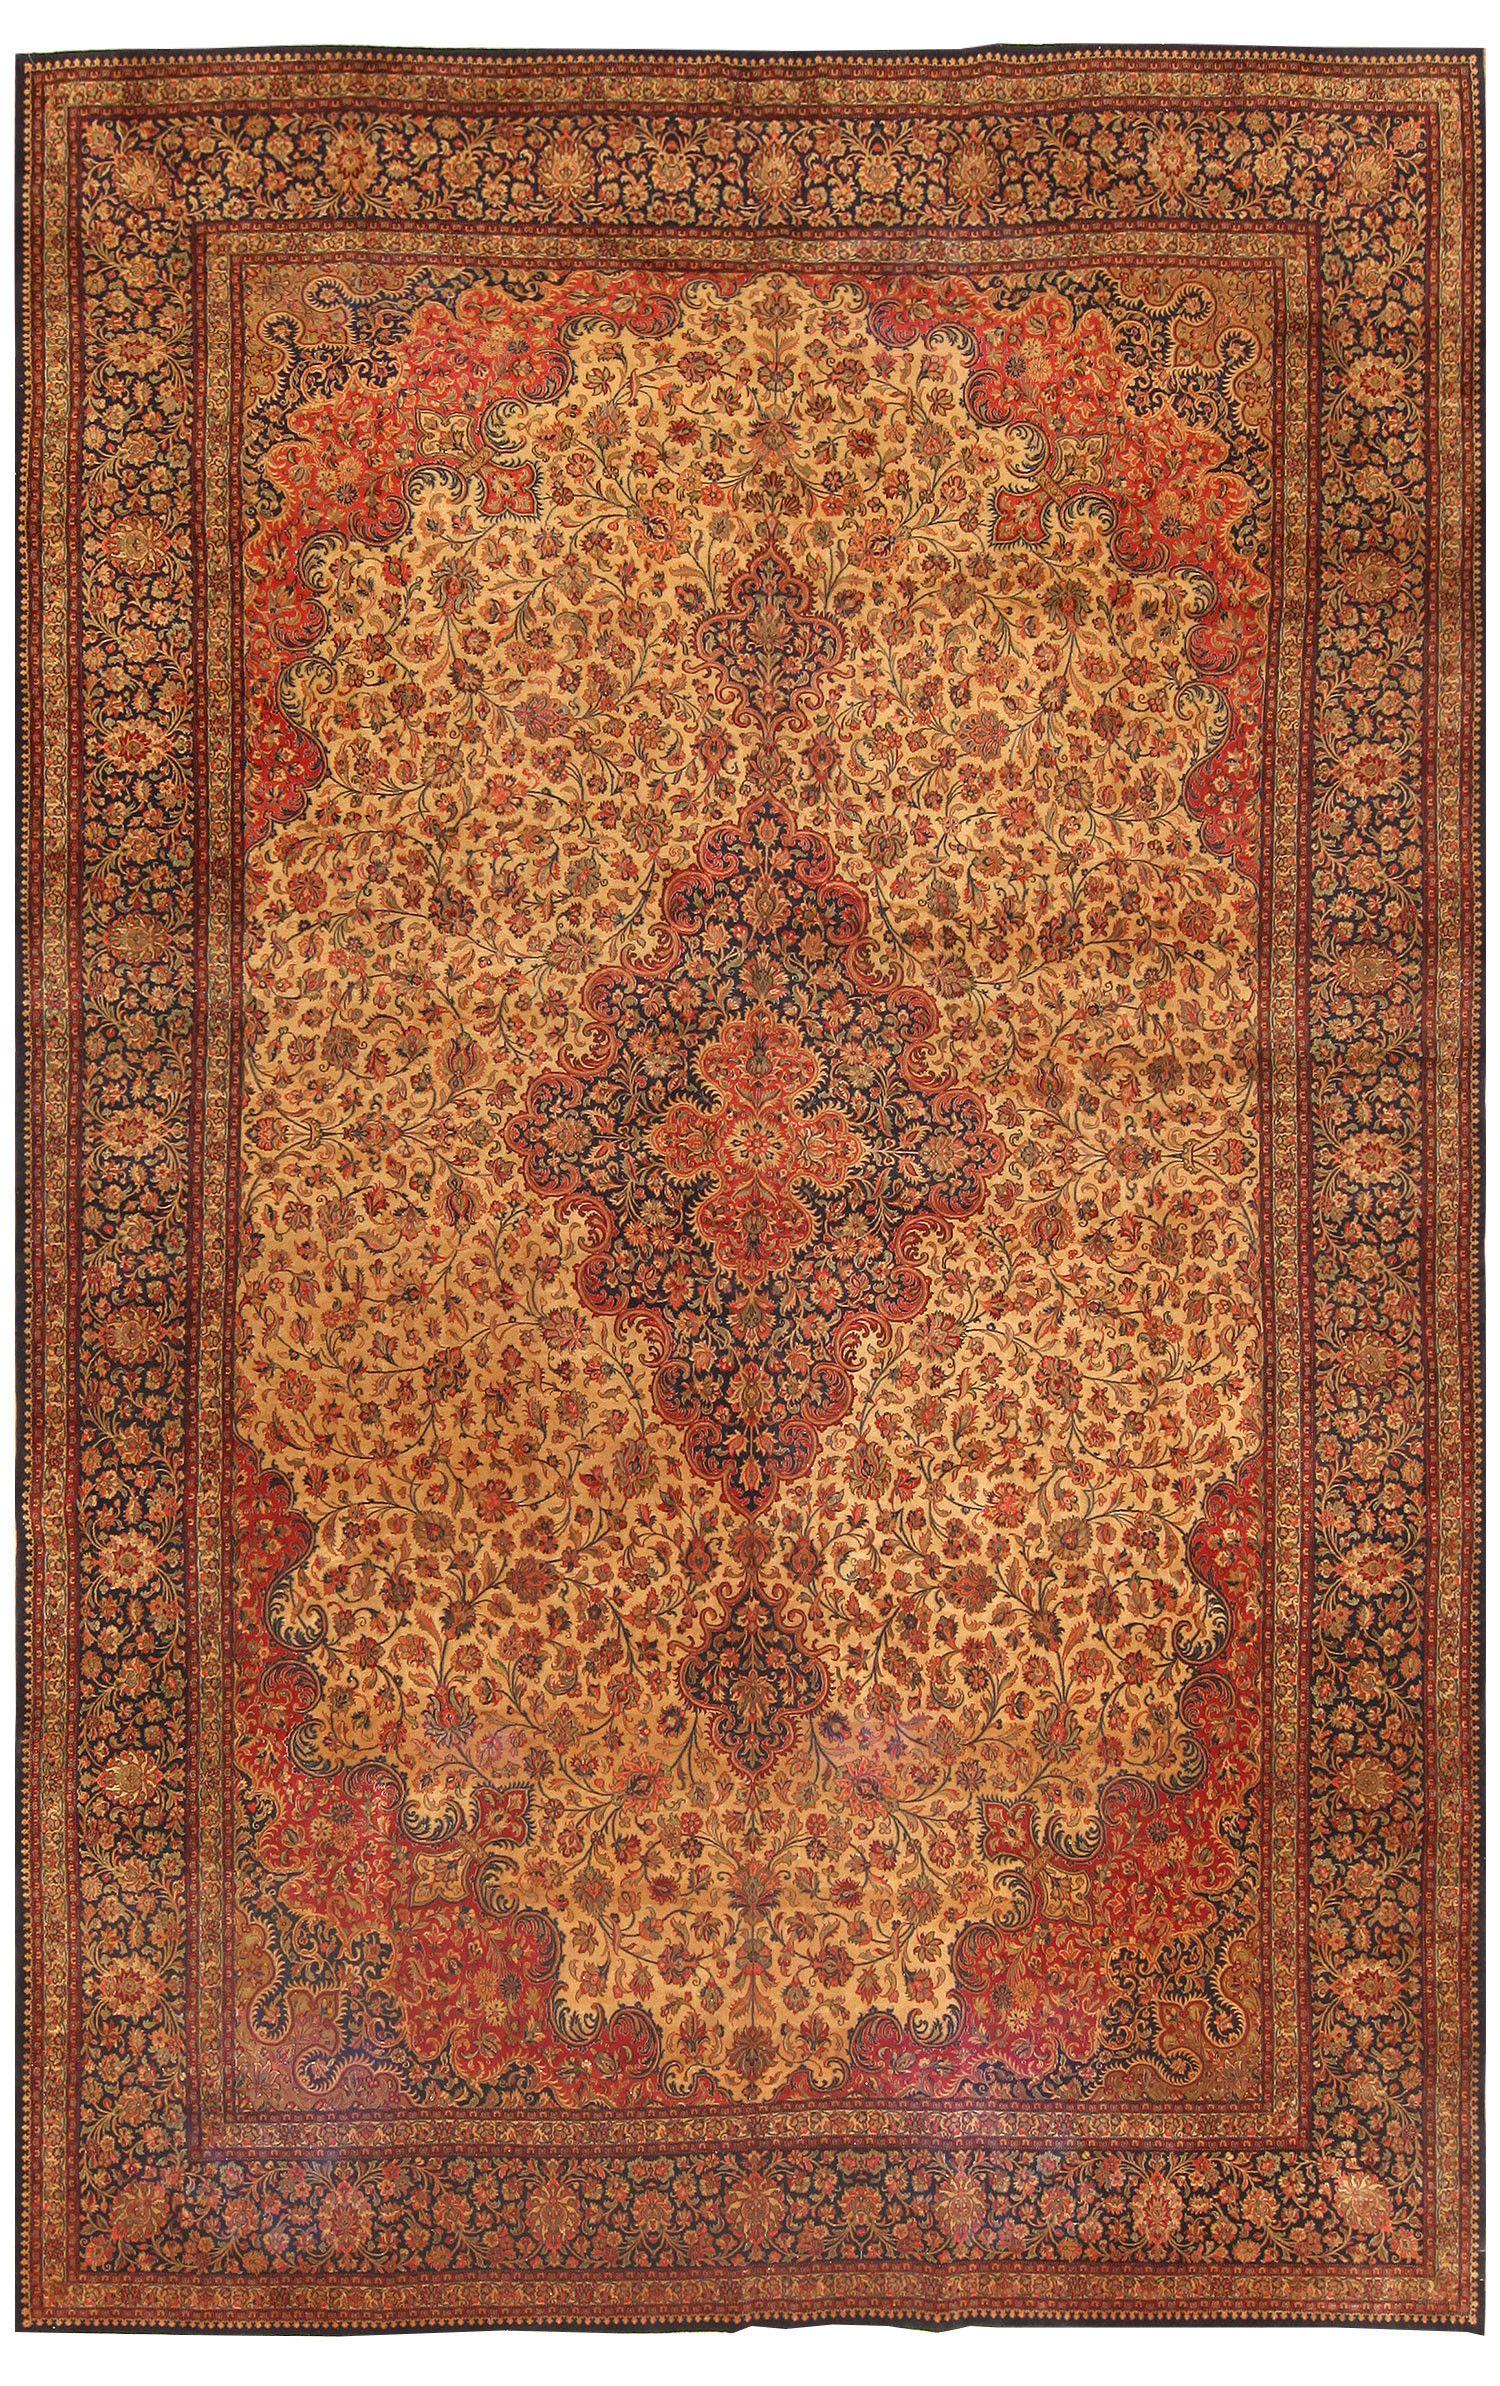 Large Vintage Persian Qum Rug 50326